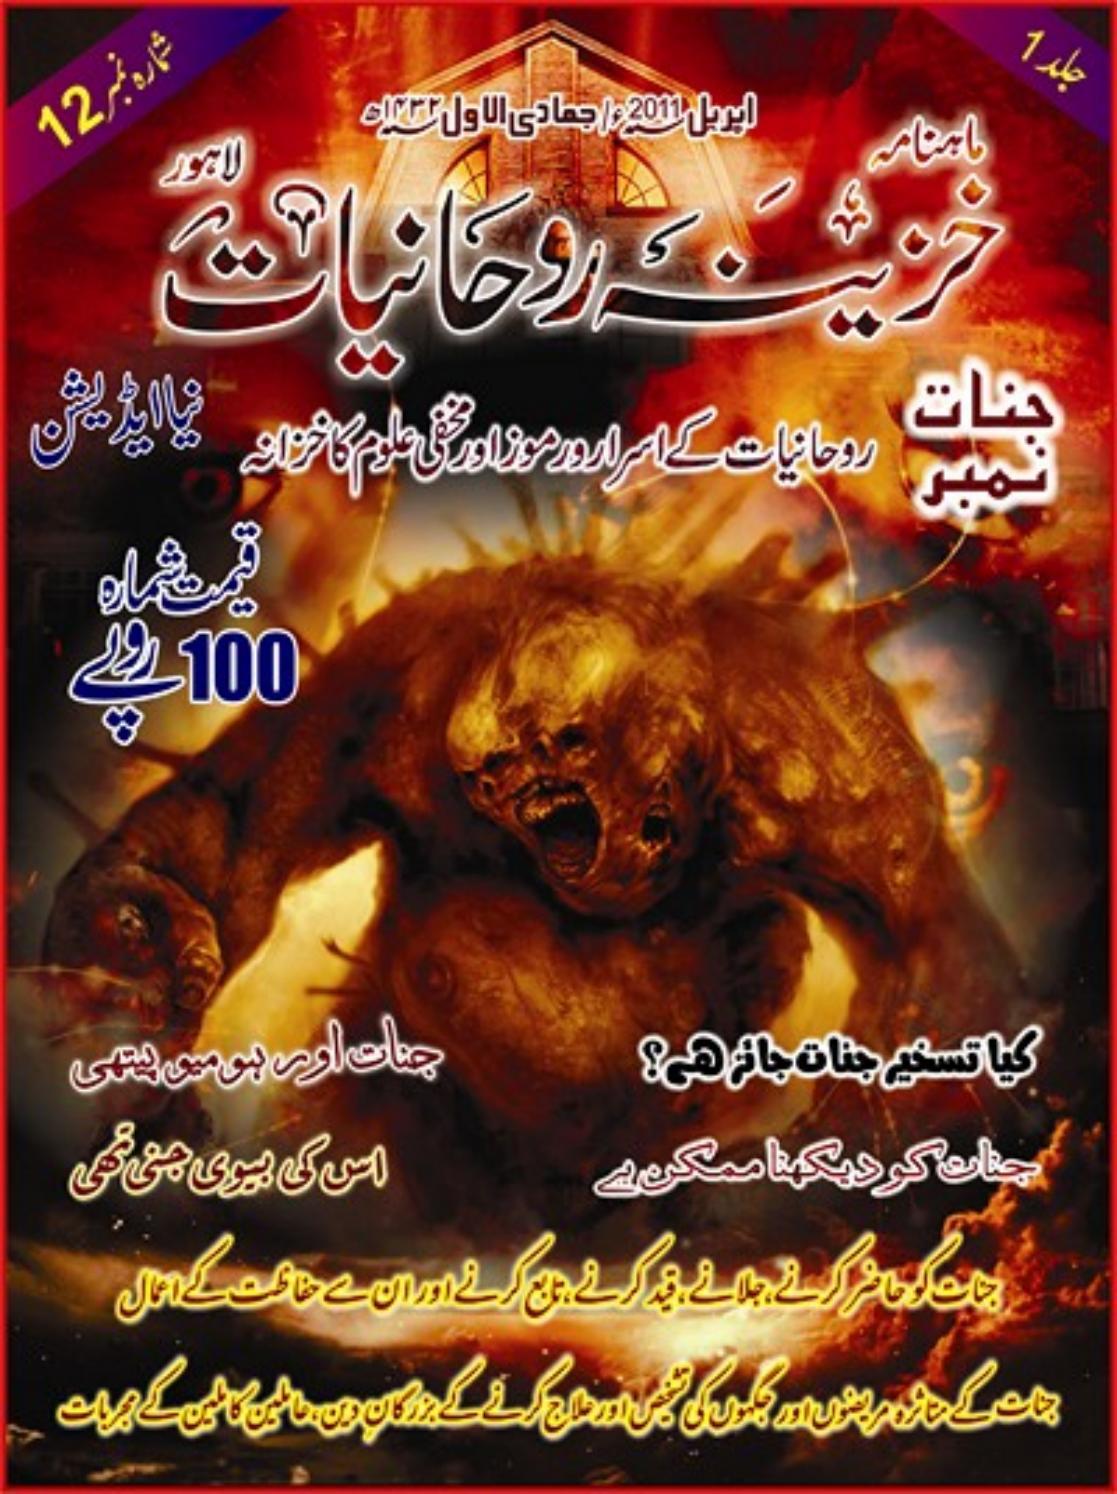 Khazeena e Rohaniyat Jinaat PDF Free Download